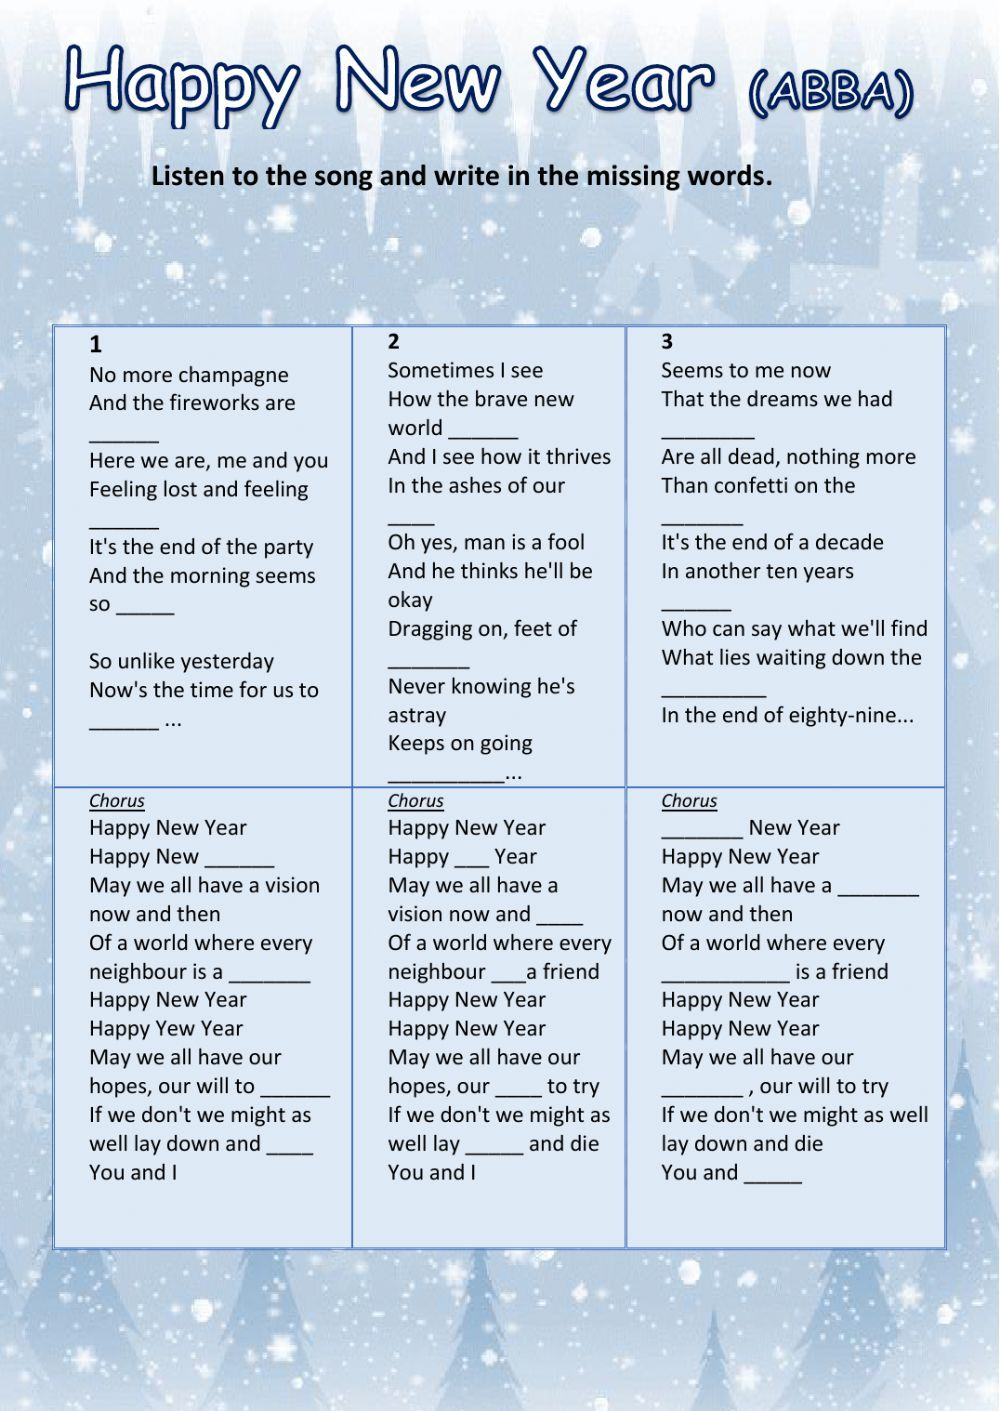 HAPPY NEW YEAR (ABBA) - Ficha interactiva inglés secundaria | In a ...